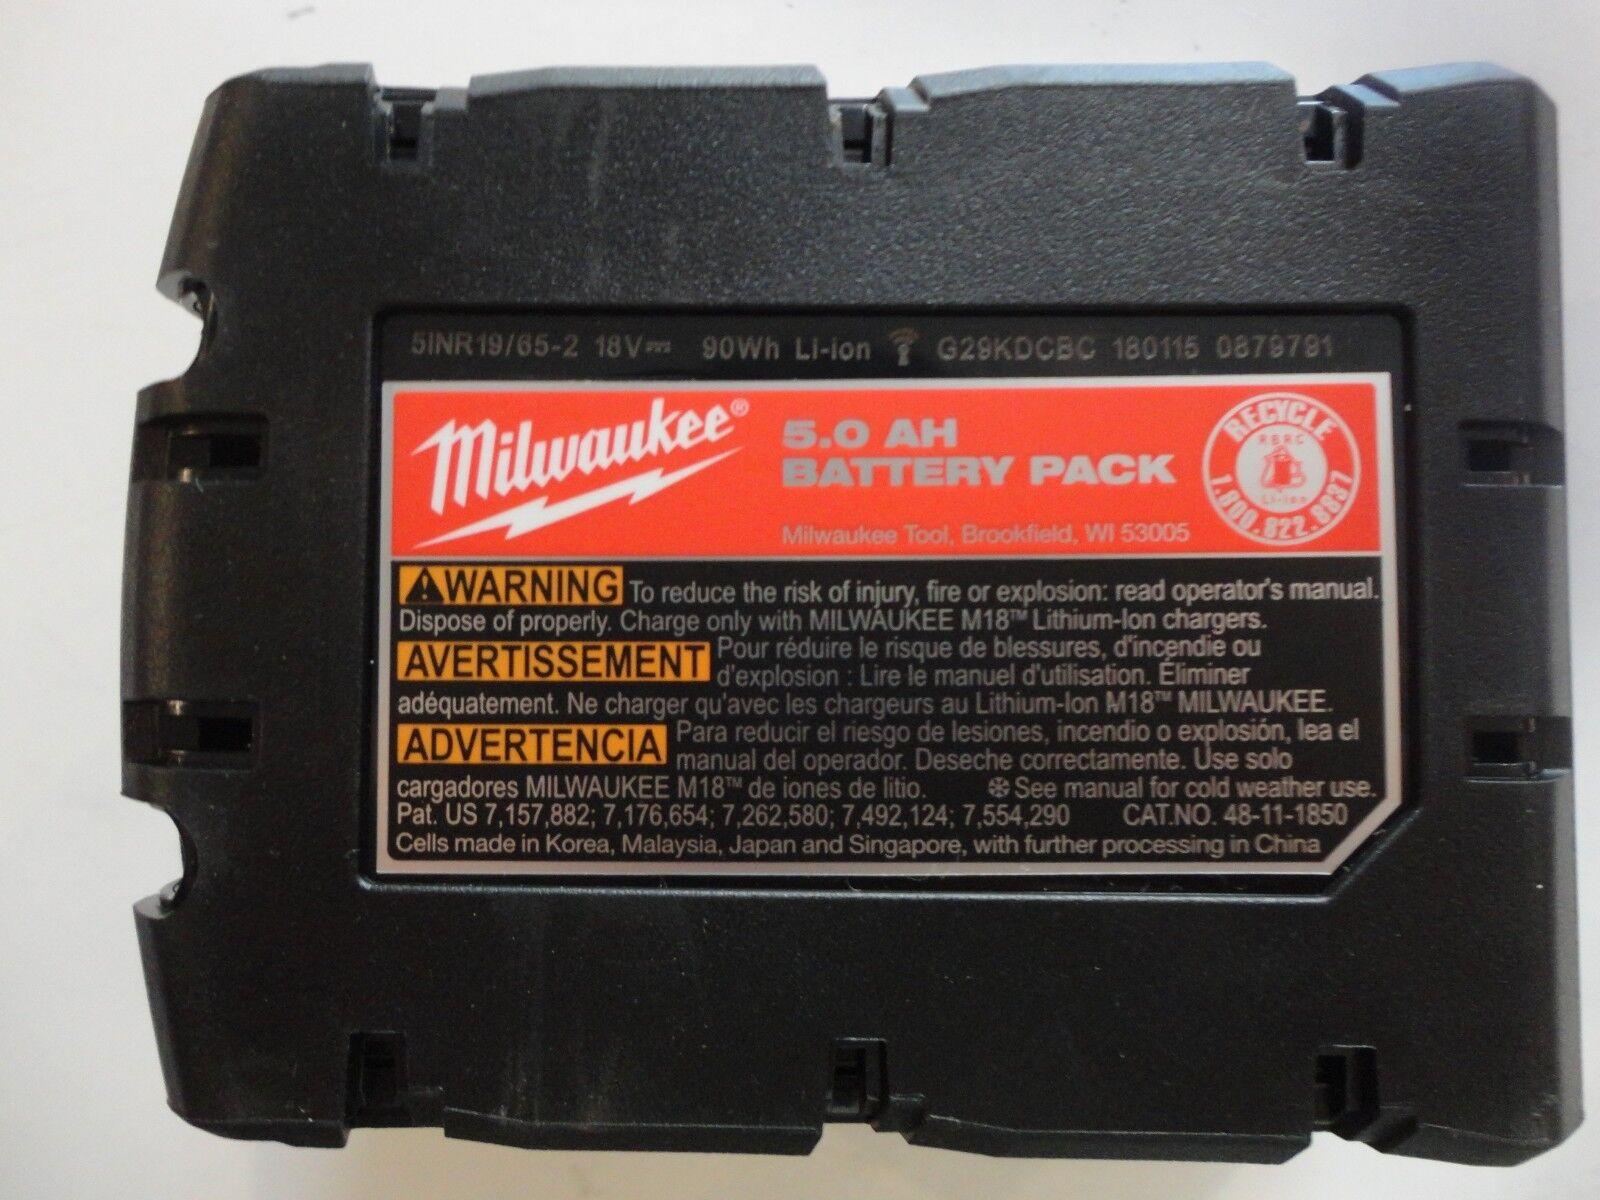 (2) MILWAUKEE 18V 18 Volt L i- Ion 48-11-1850 XC 5.0 AH Battery packs 48-11-1852 7